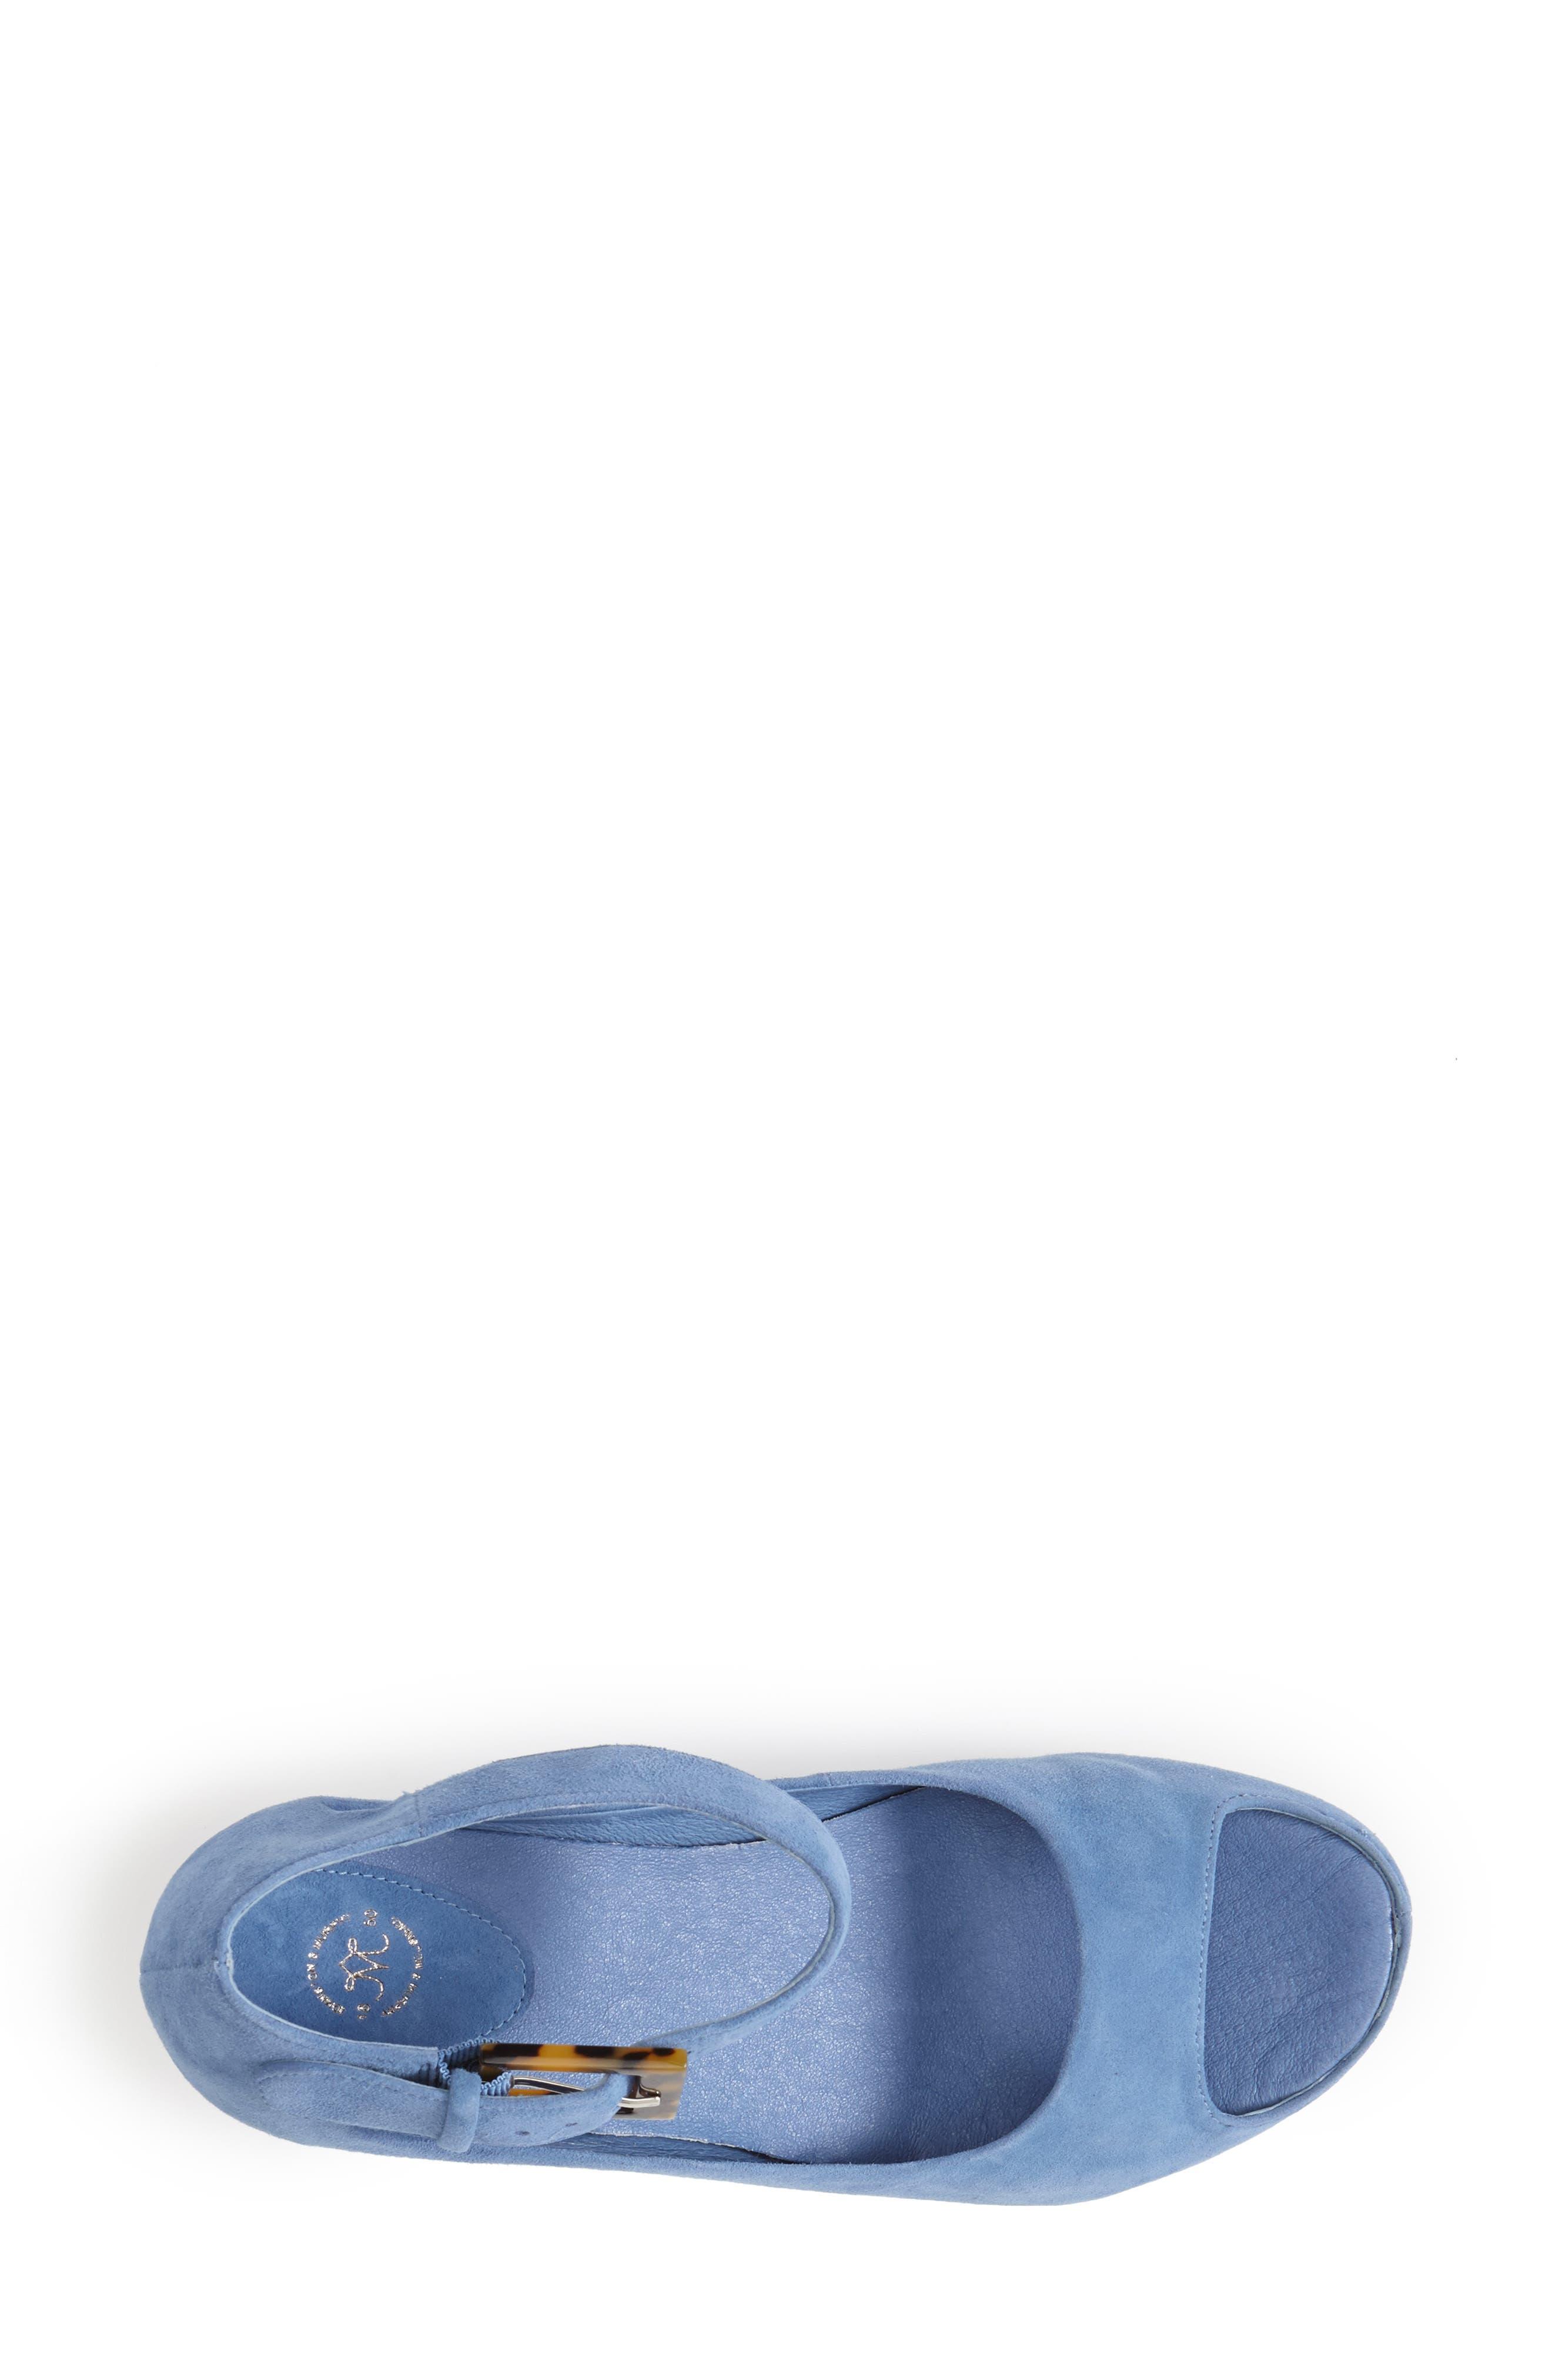 'Tricia' Ankle Strap Sandal,                             Alternate thumbnail 28, color,